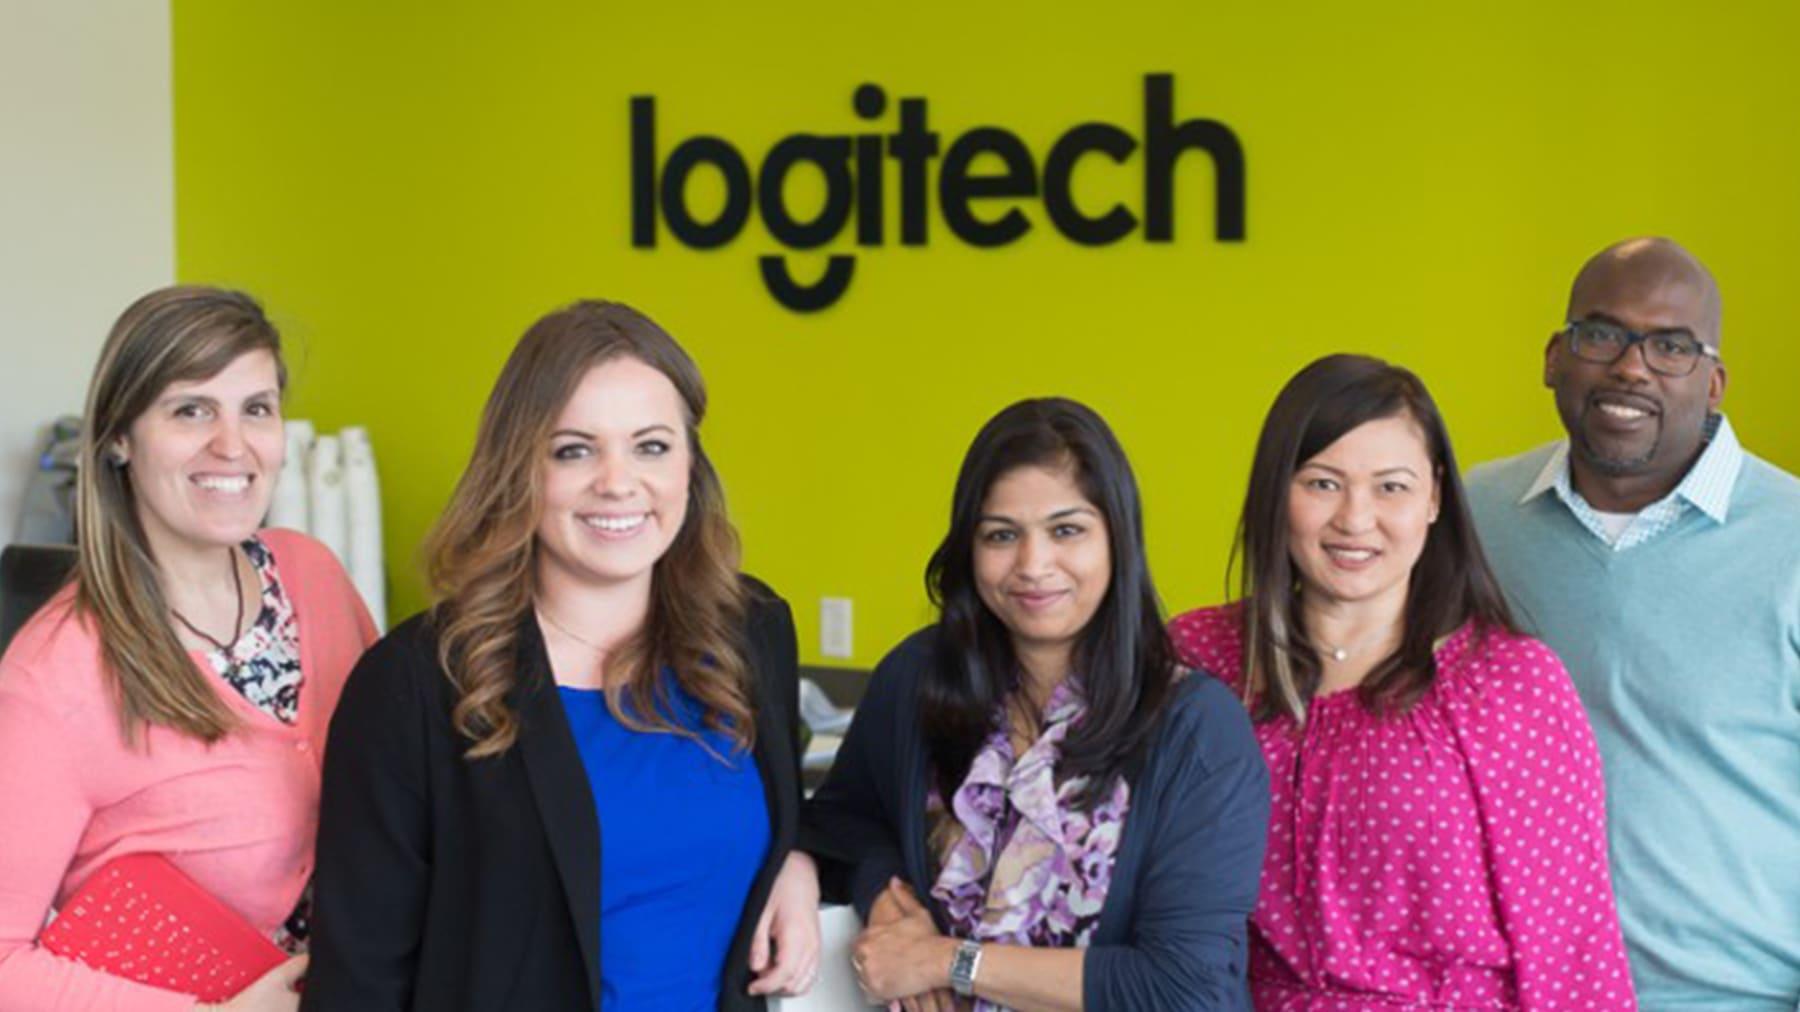 Logitechs personalavdelning